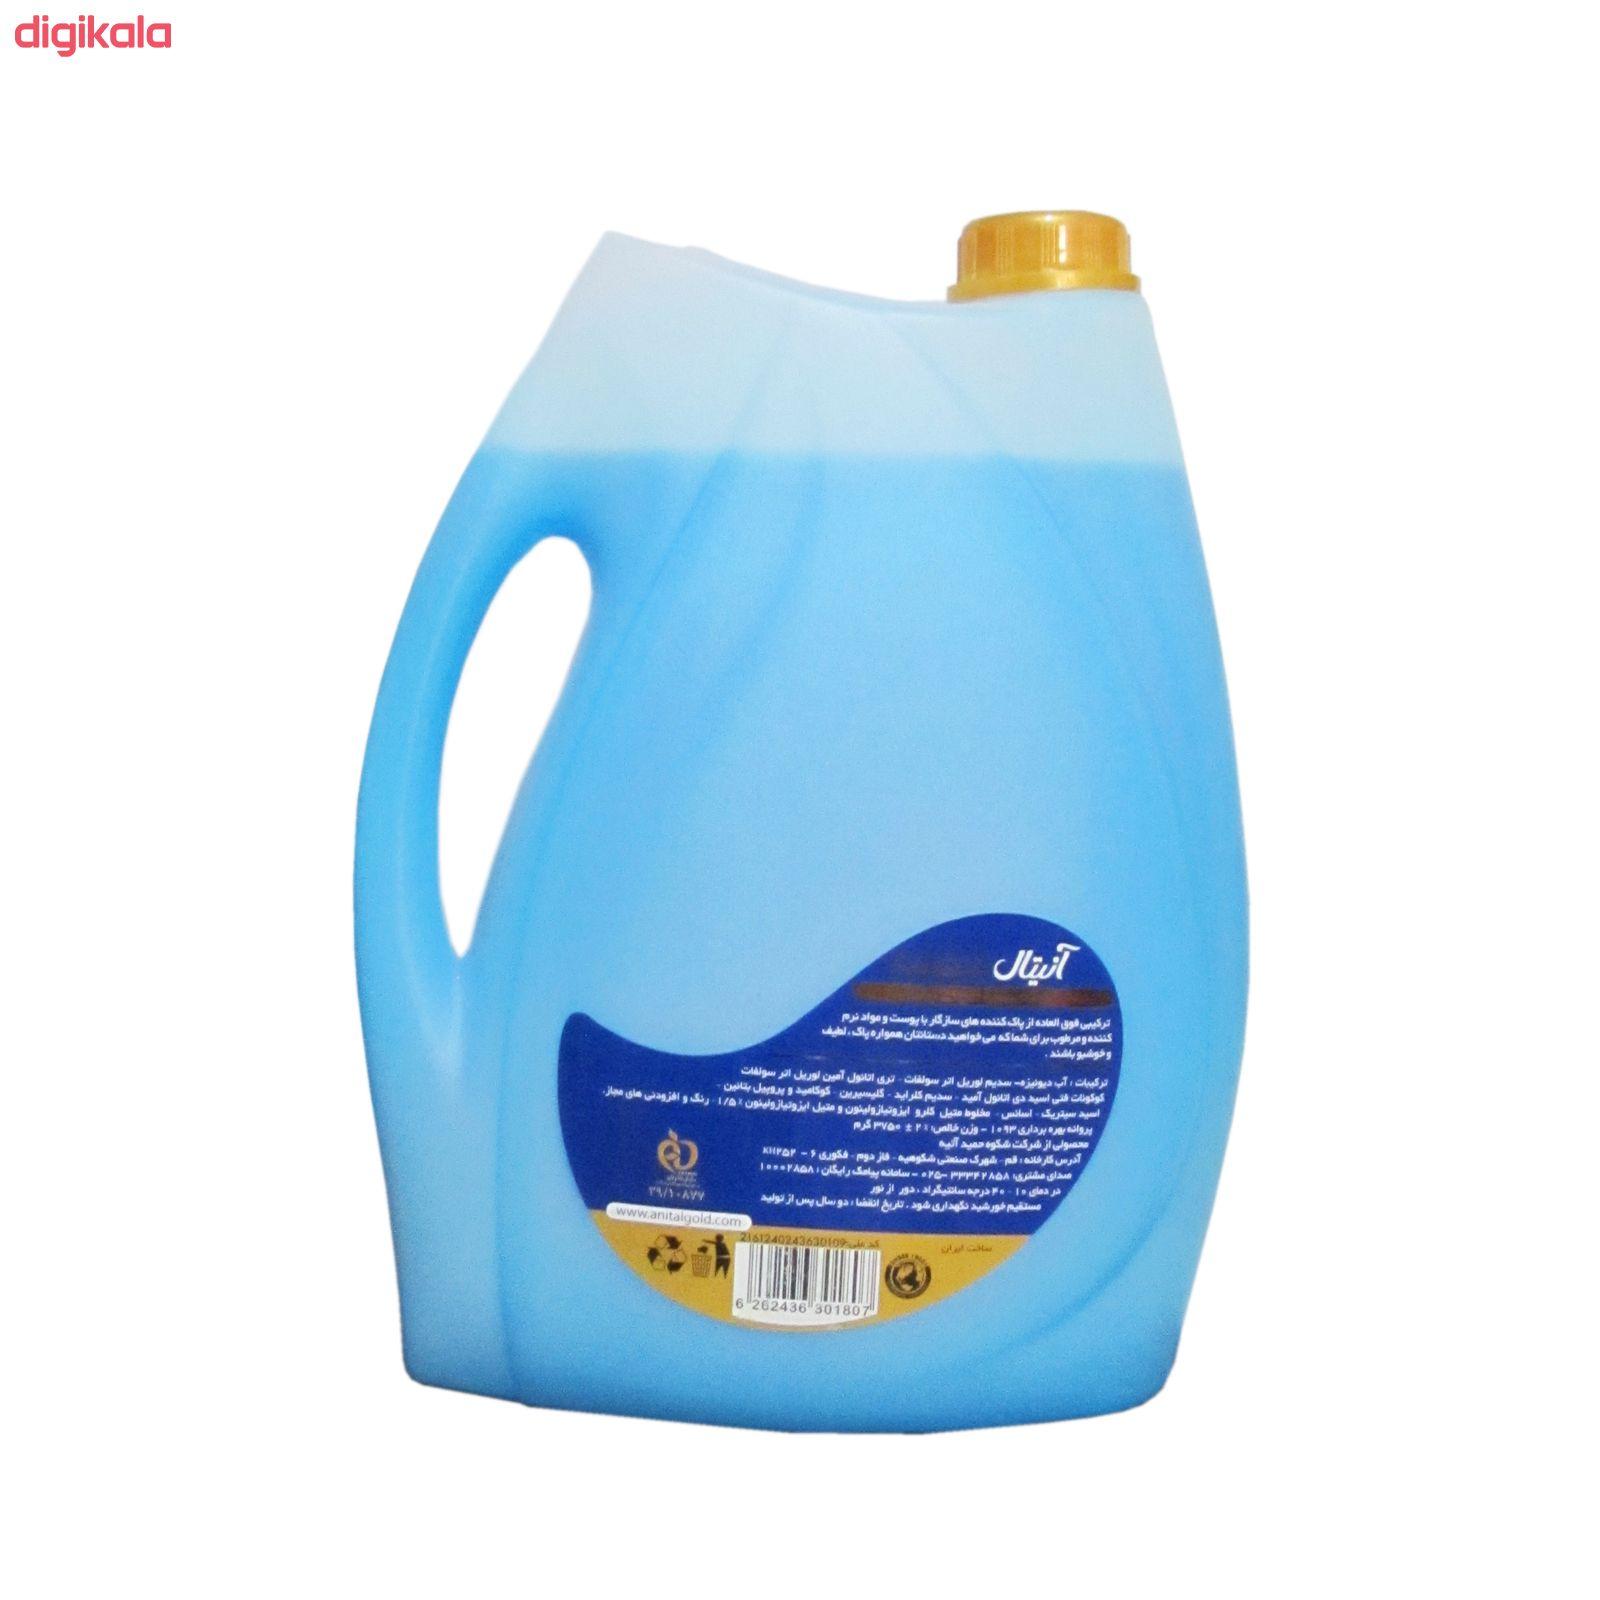 مایع دستشویی آنیتال کد 02 وزن 3750 گرم main 1 1